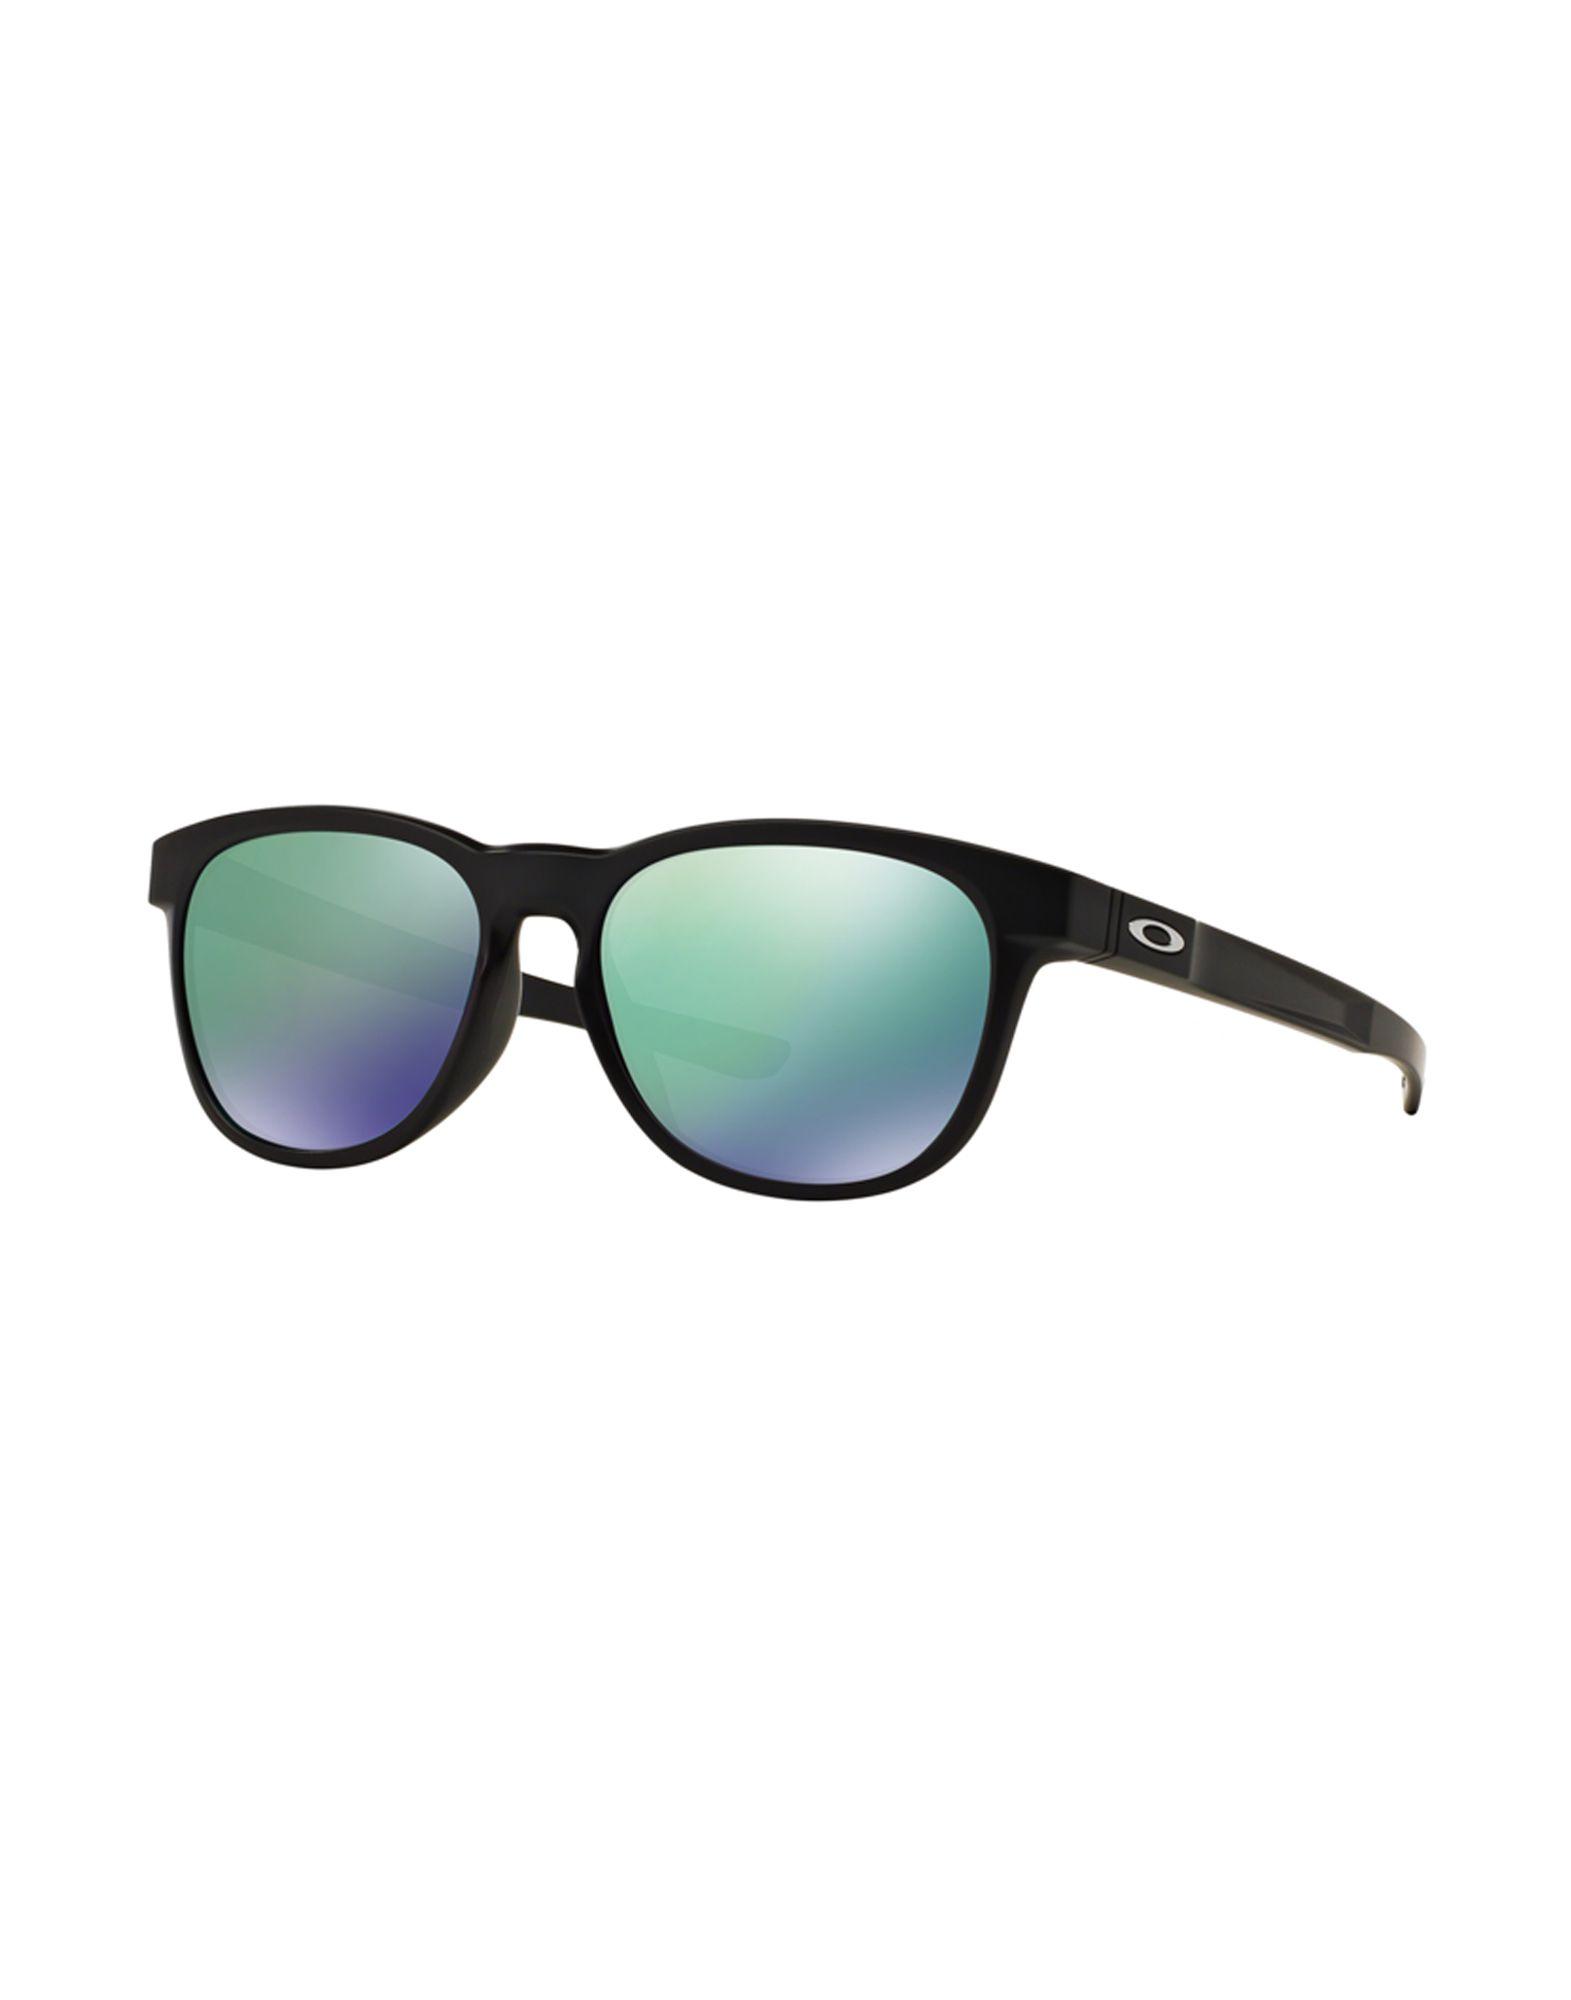 OAKLEY Солнечные очки web eyewear солнечные очки